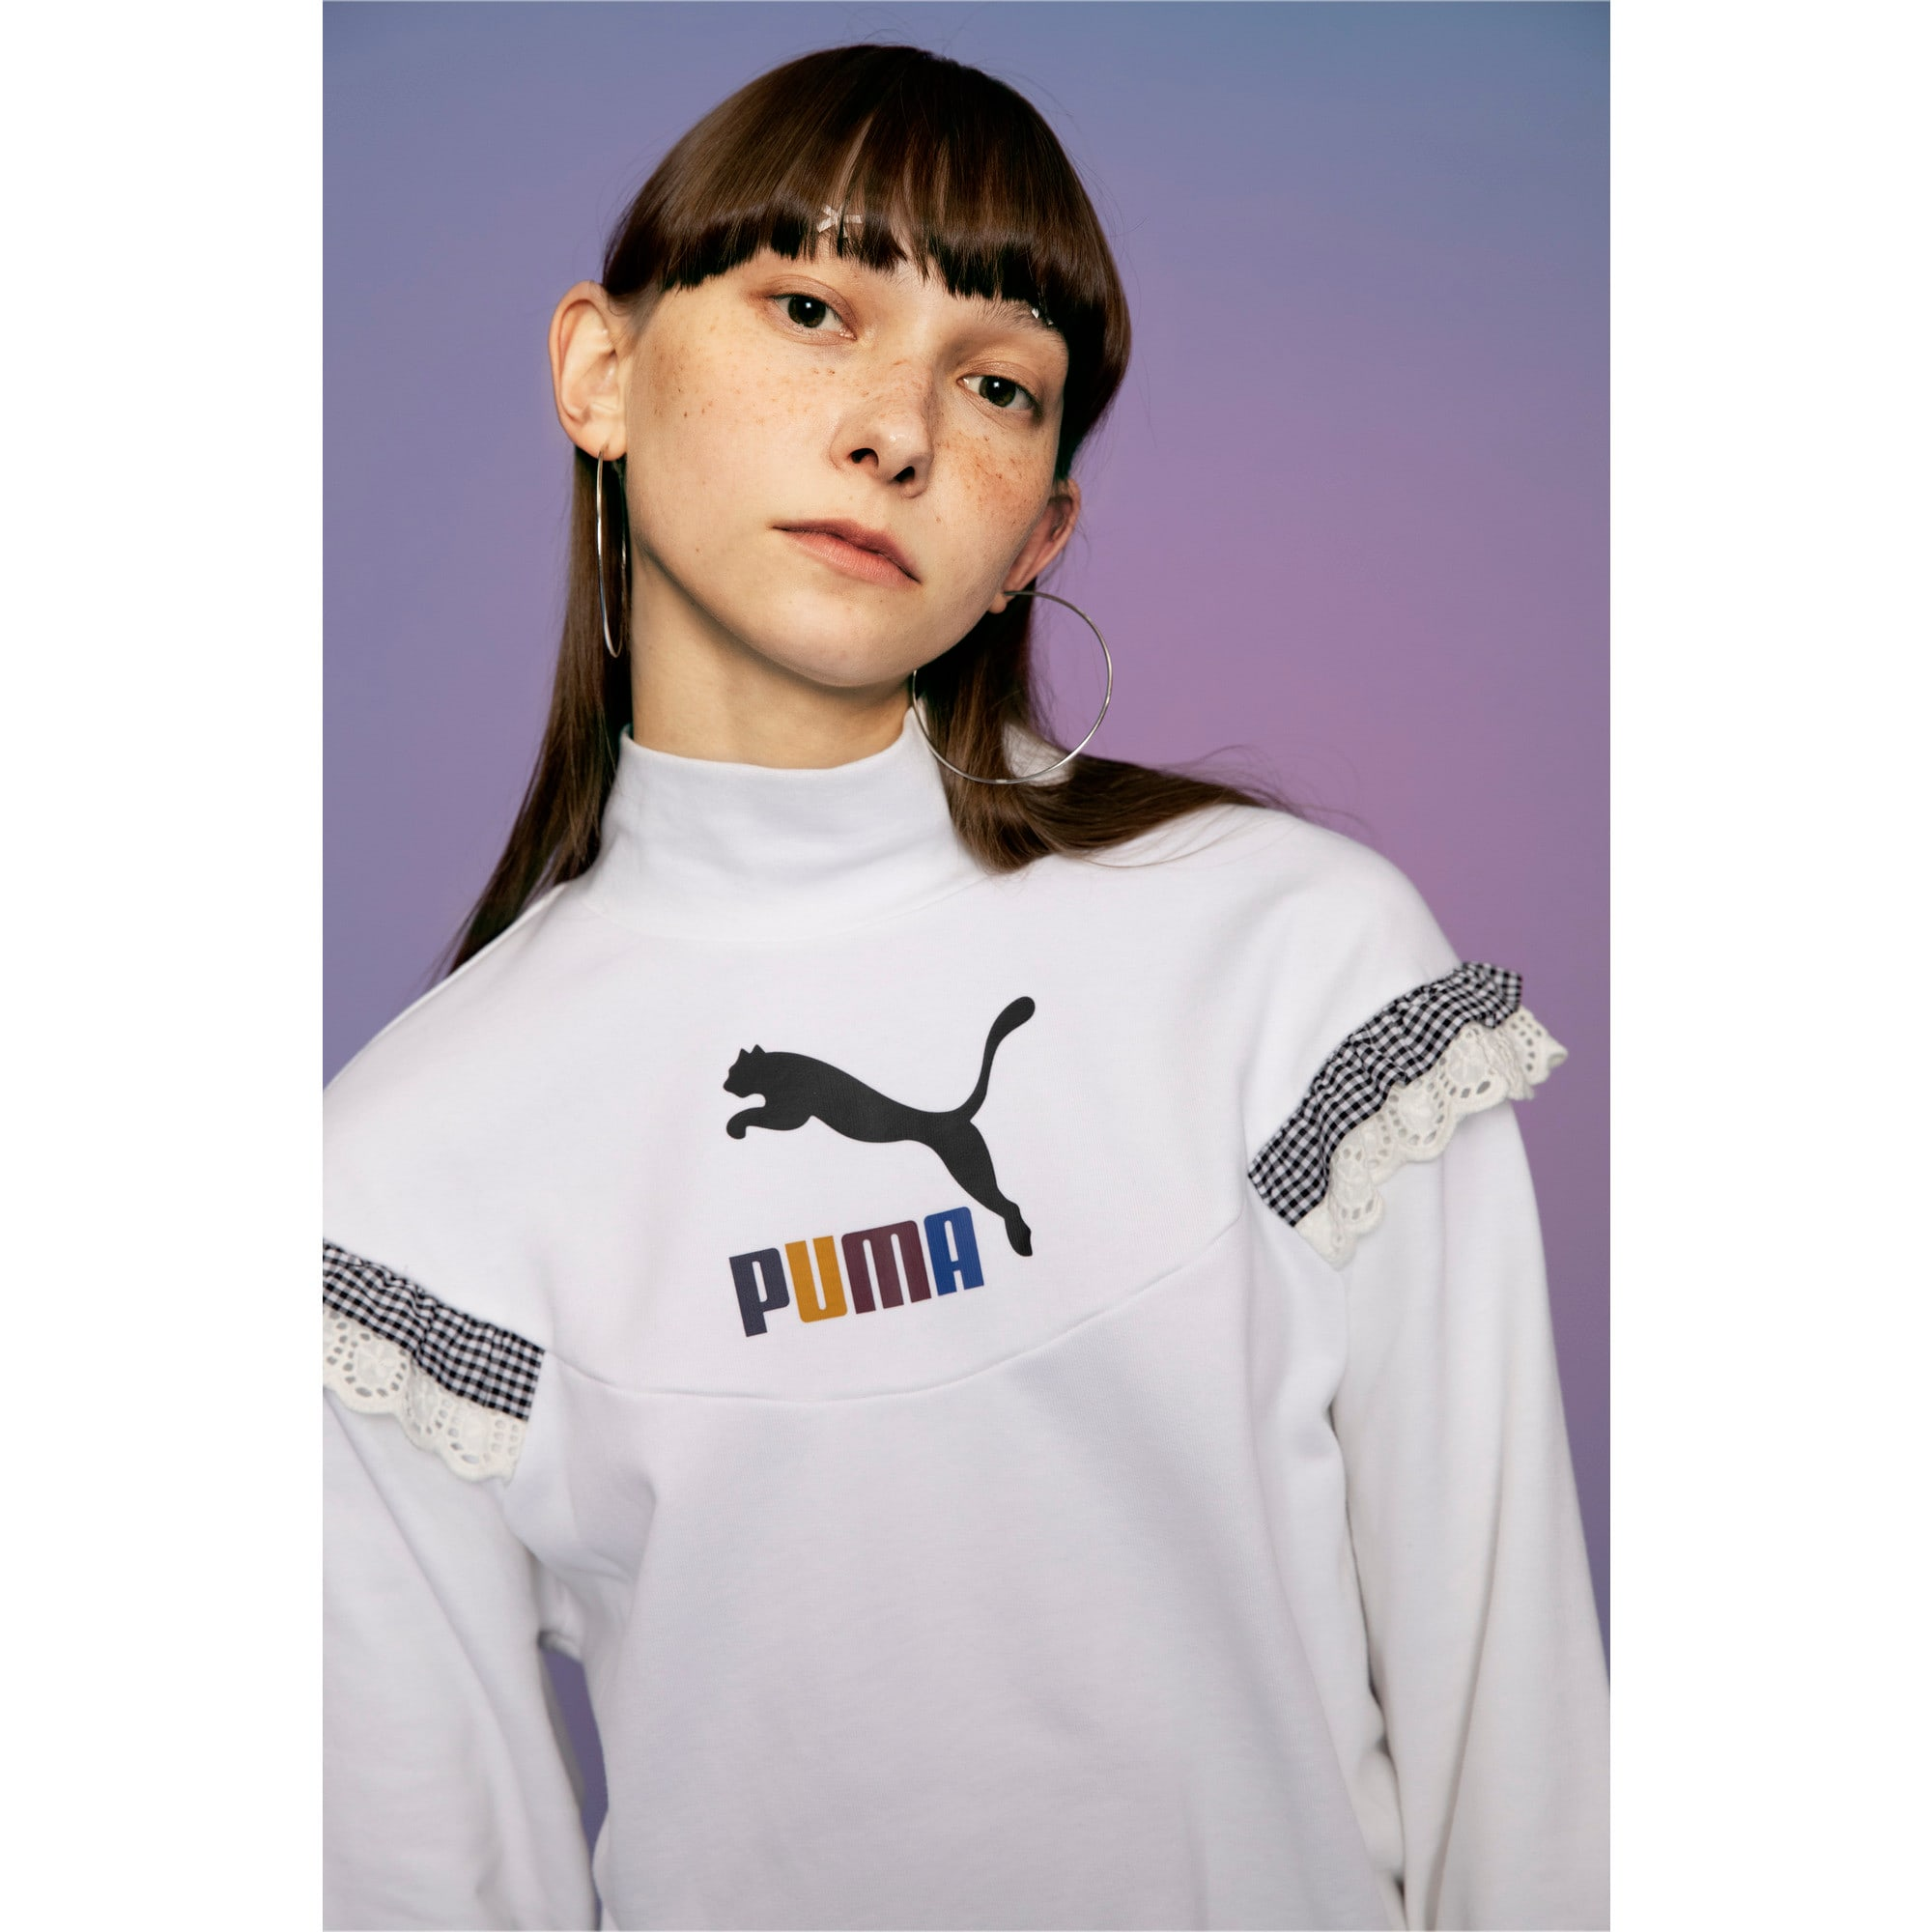 Thumbnail 8 of PUMA x TYAKASHA Women's Turtleneck Sweater, Puma White, medium